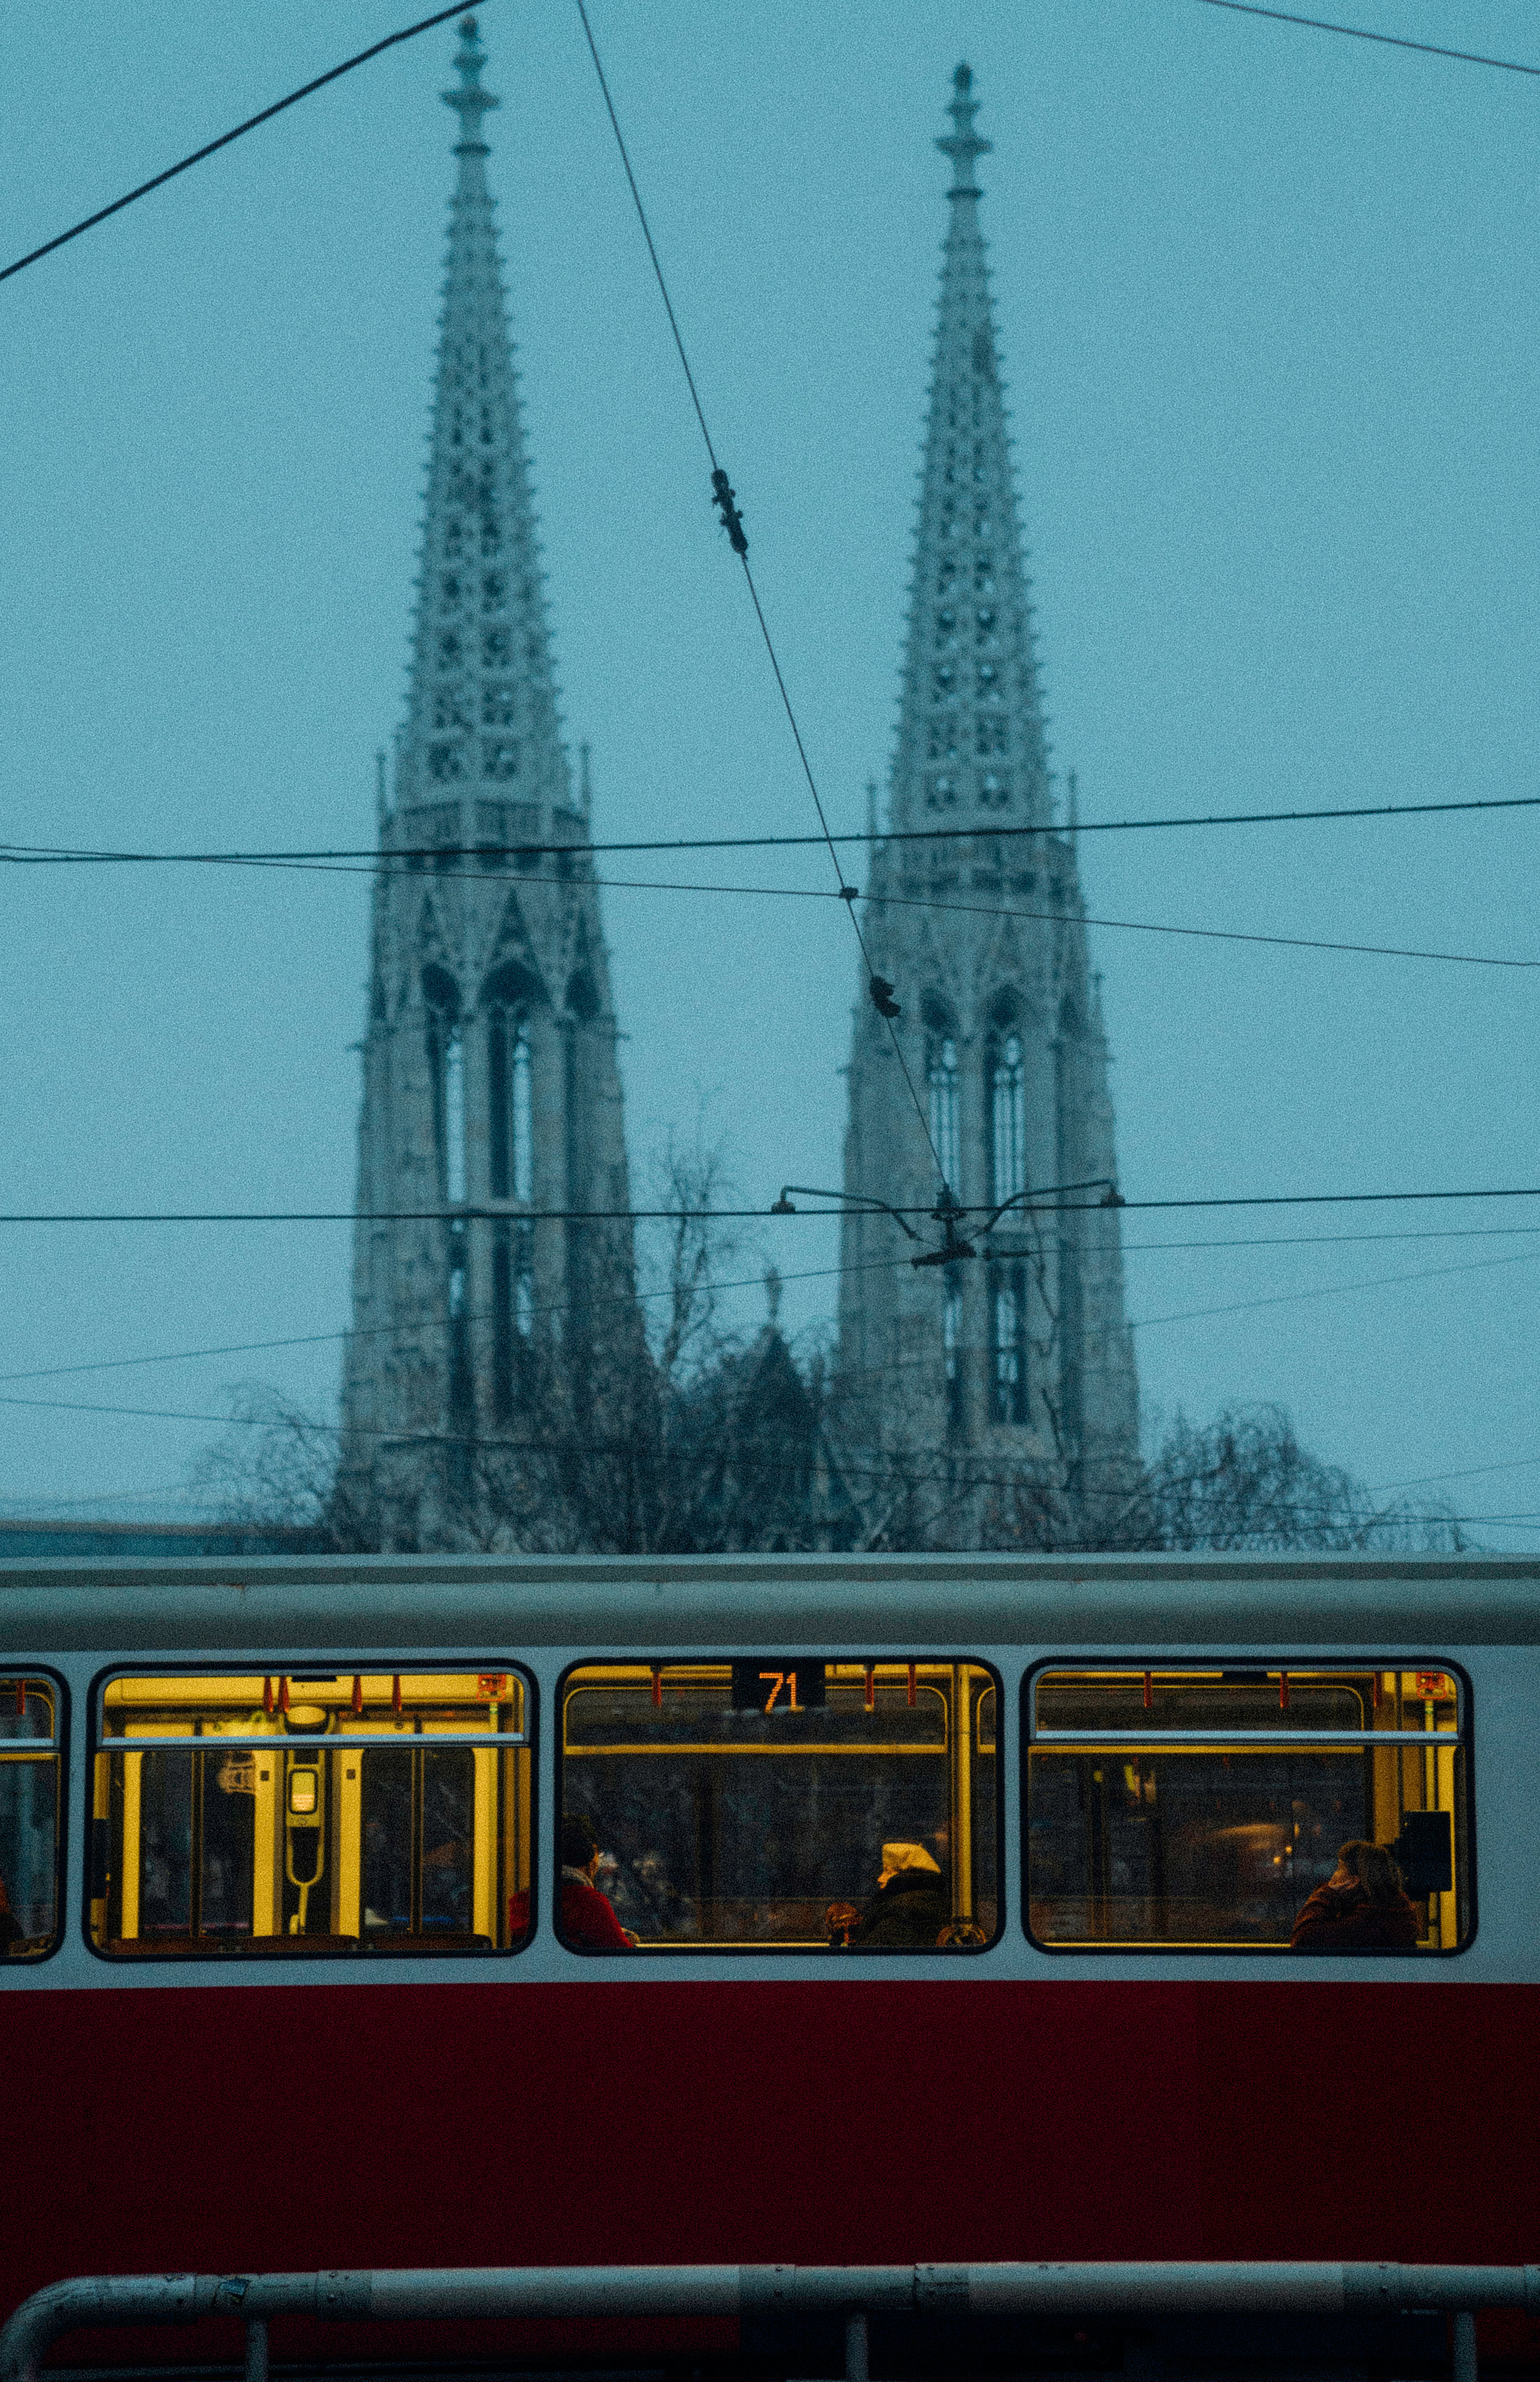 ViennaTrain-2.jpg